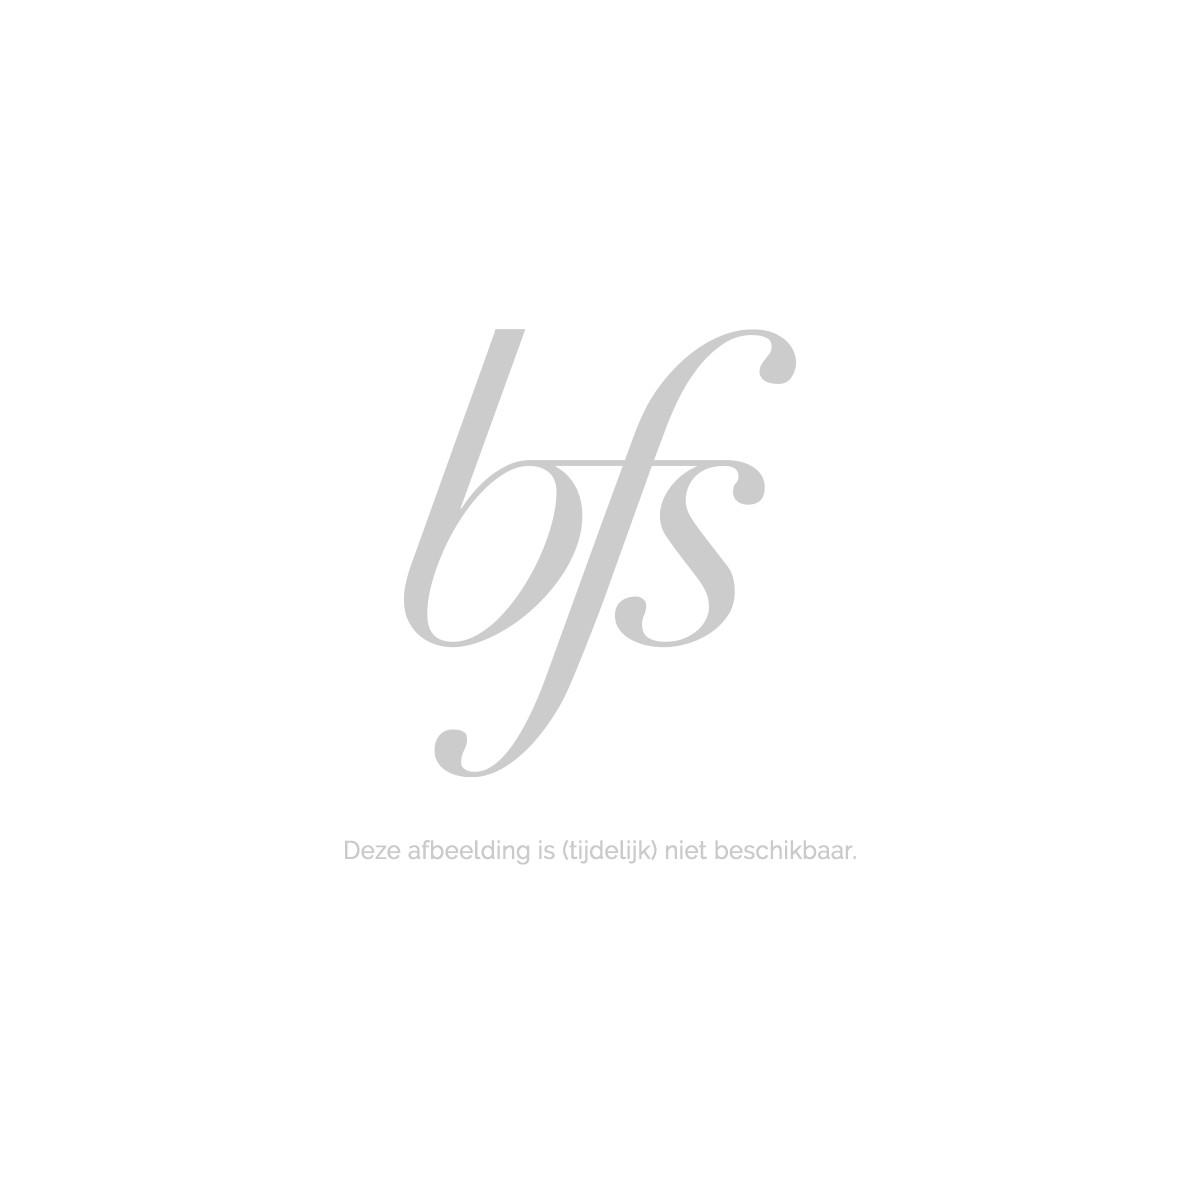 Redken Fashion 07 Waves Sea Salt Spray Texturize 250 Ml